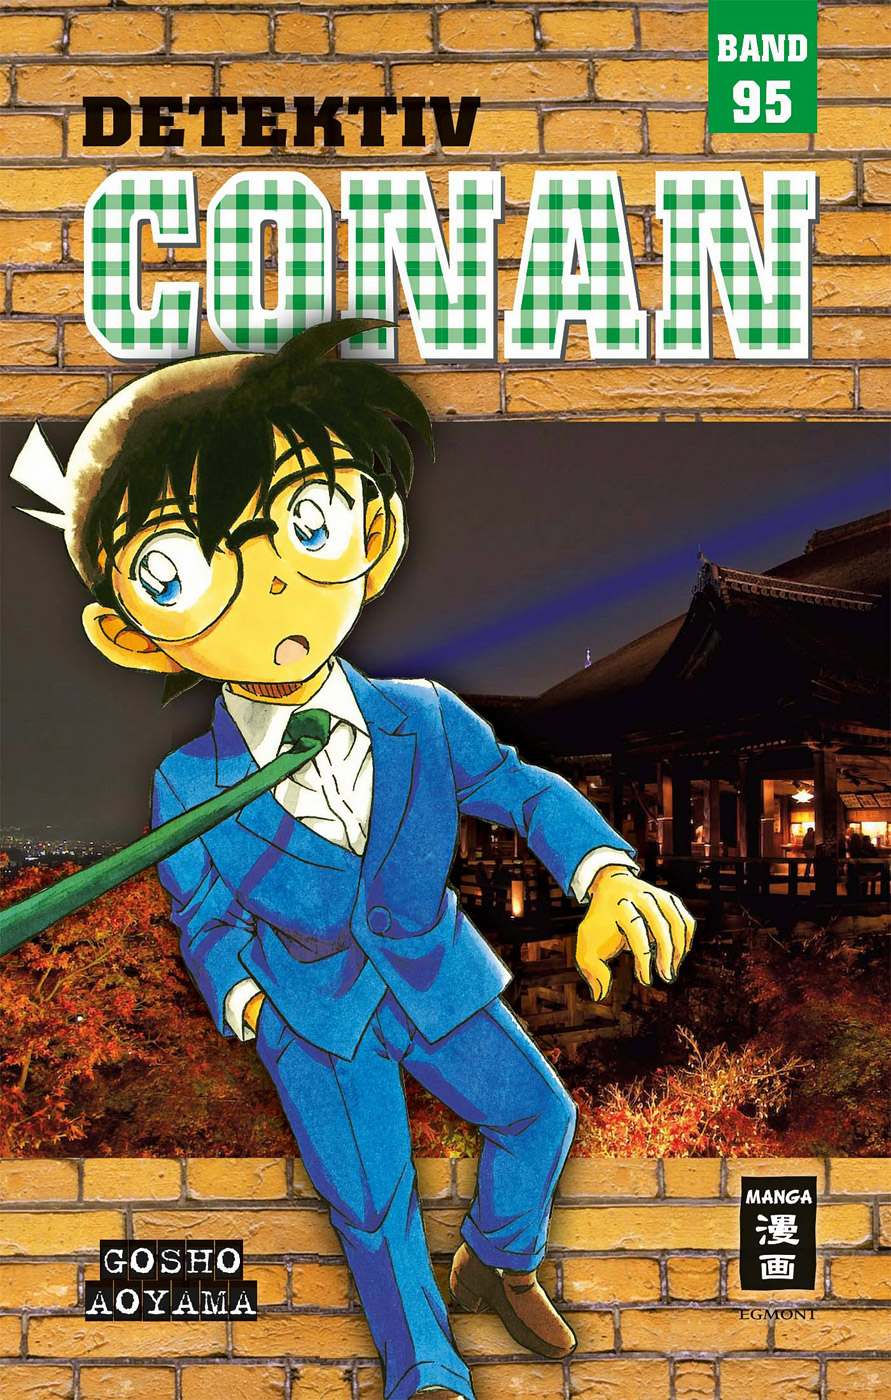 Detektiv Conan Hauptstory